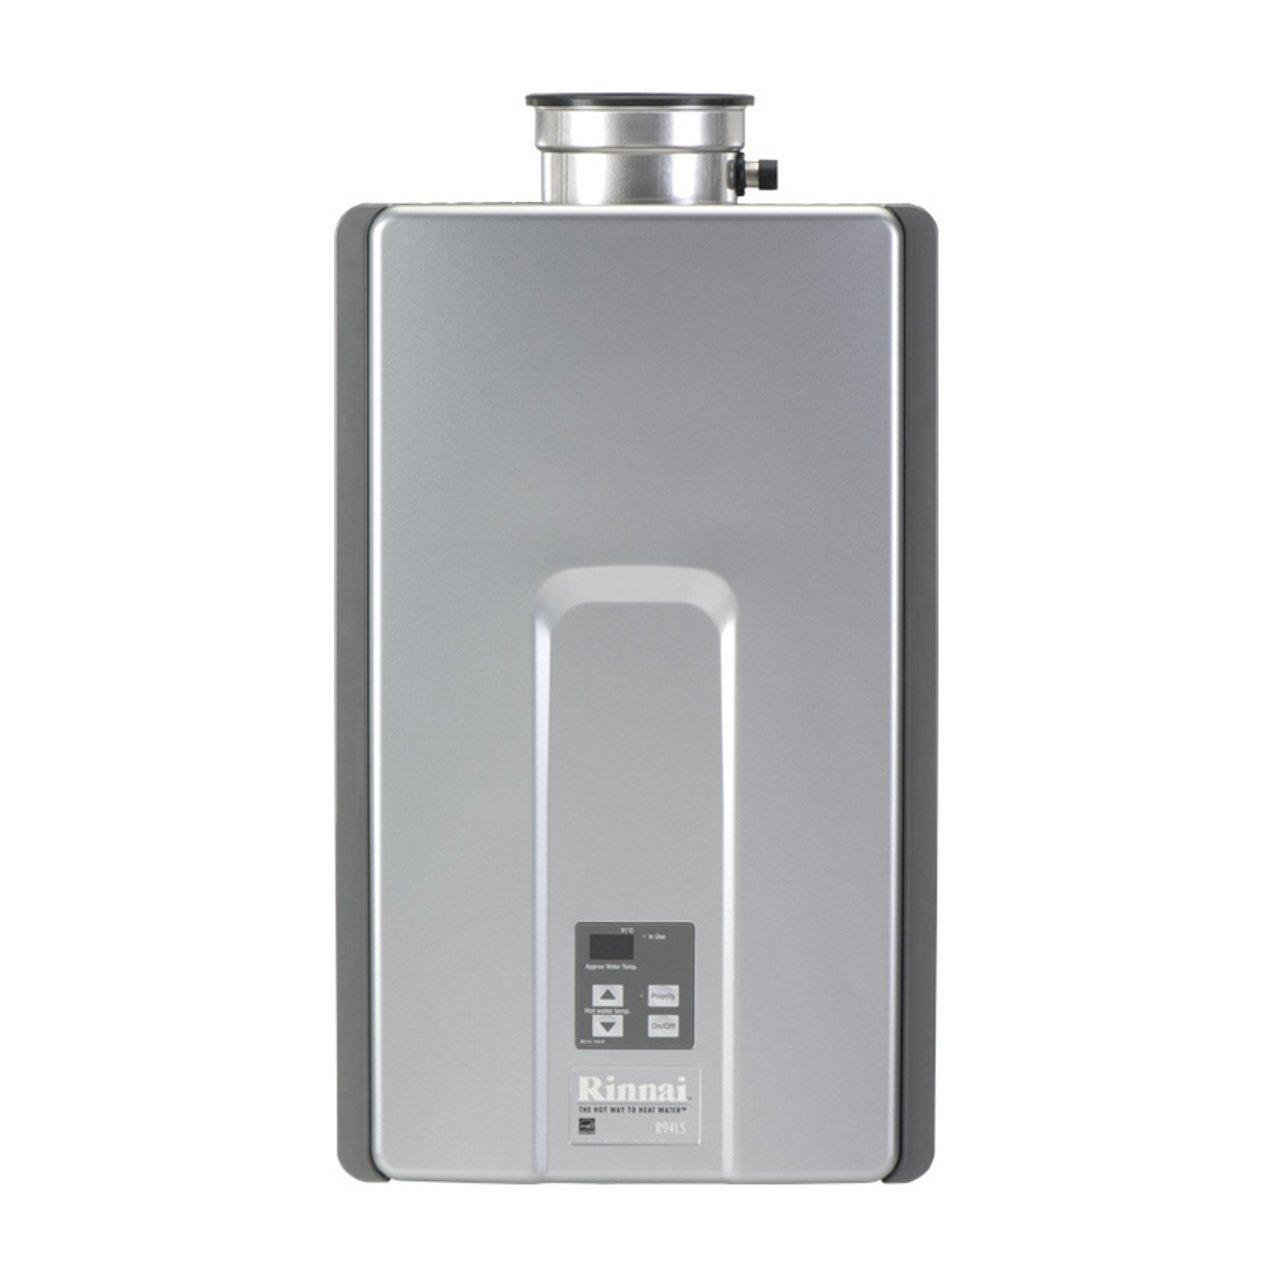 Rinnai_RL75iN_tankless_water_heater